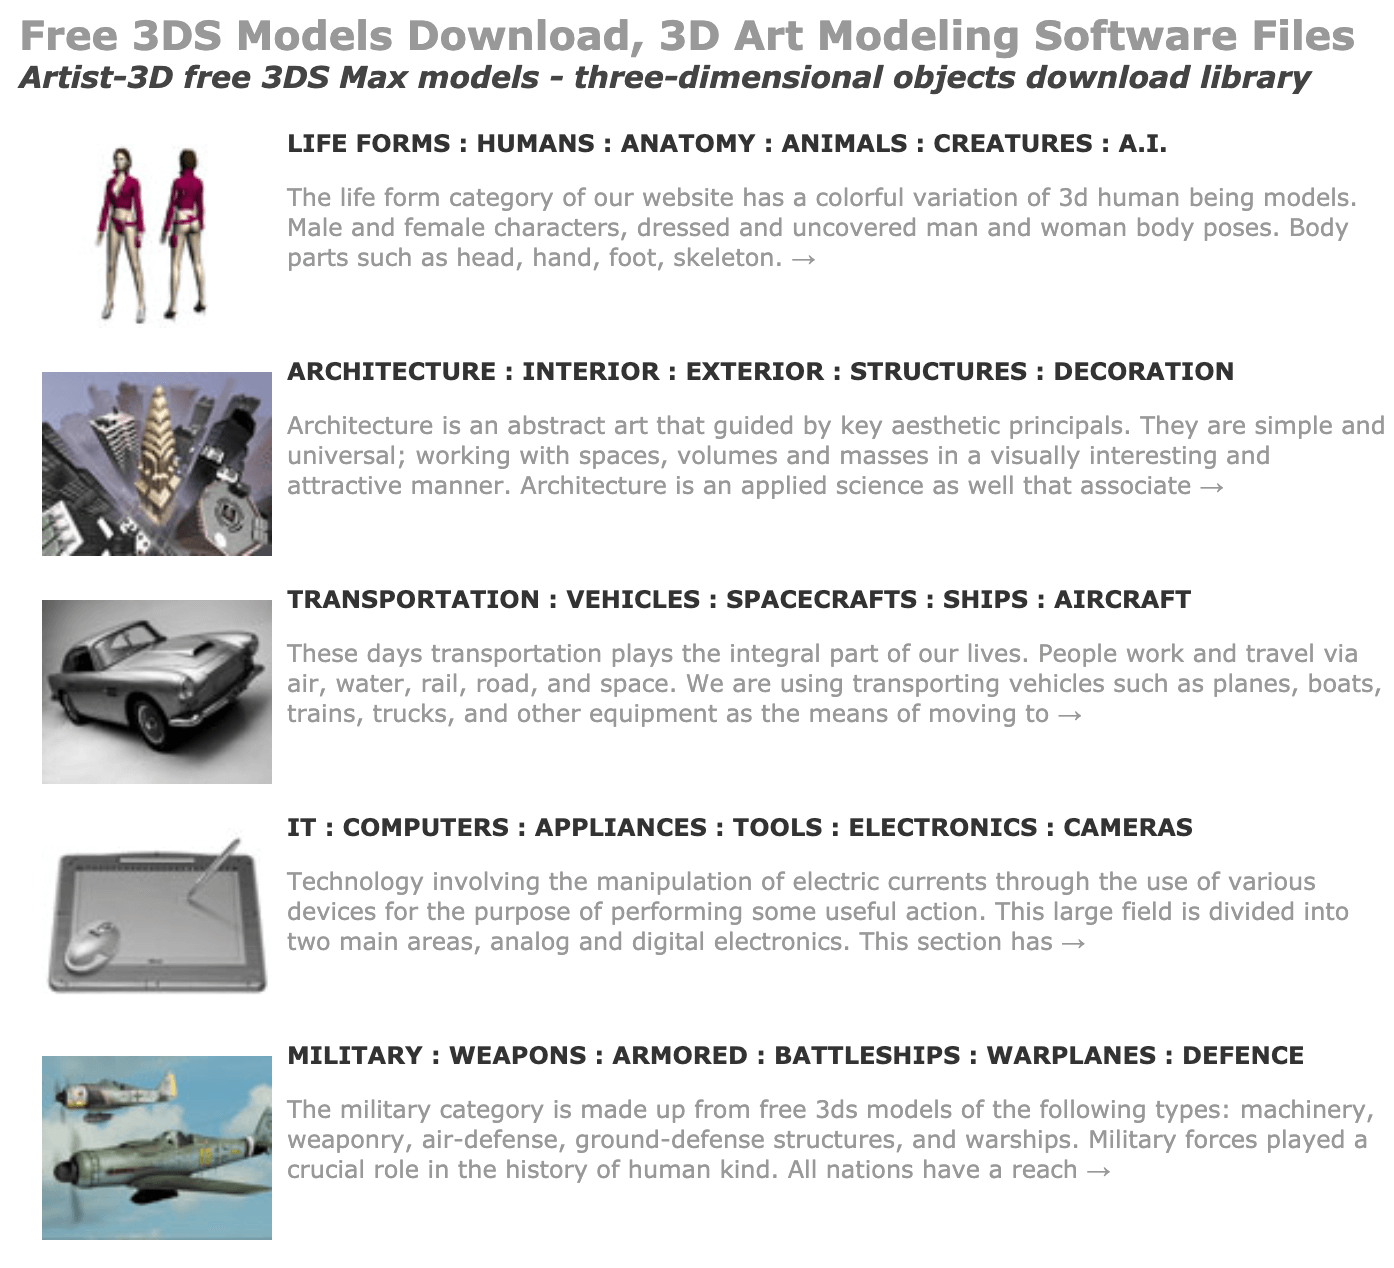 Artist-3D free 3DS Max models